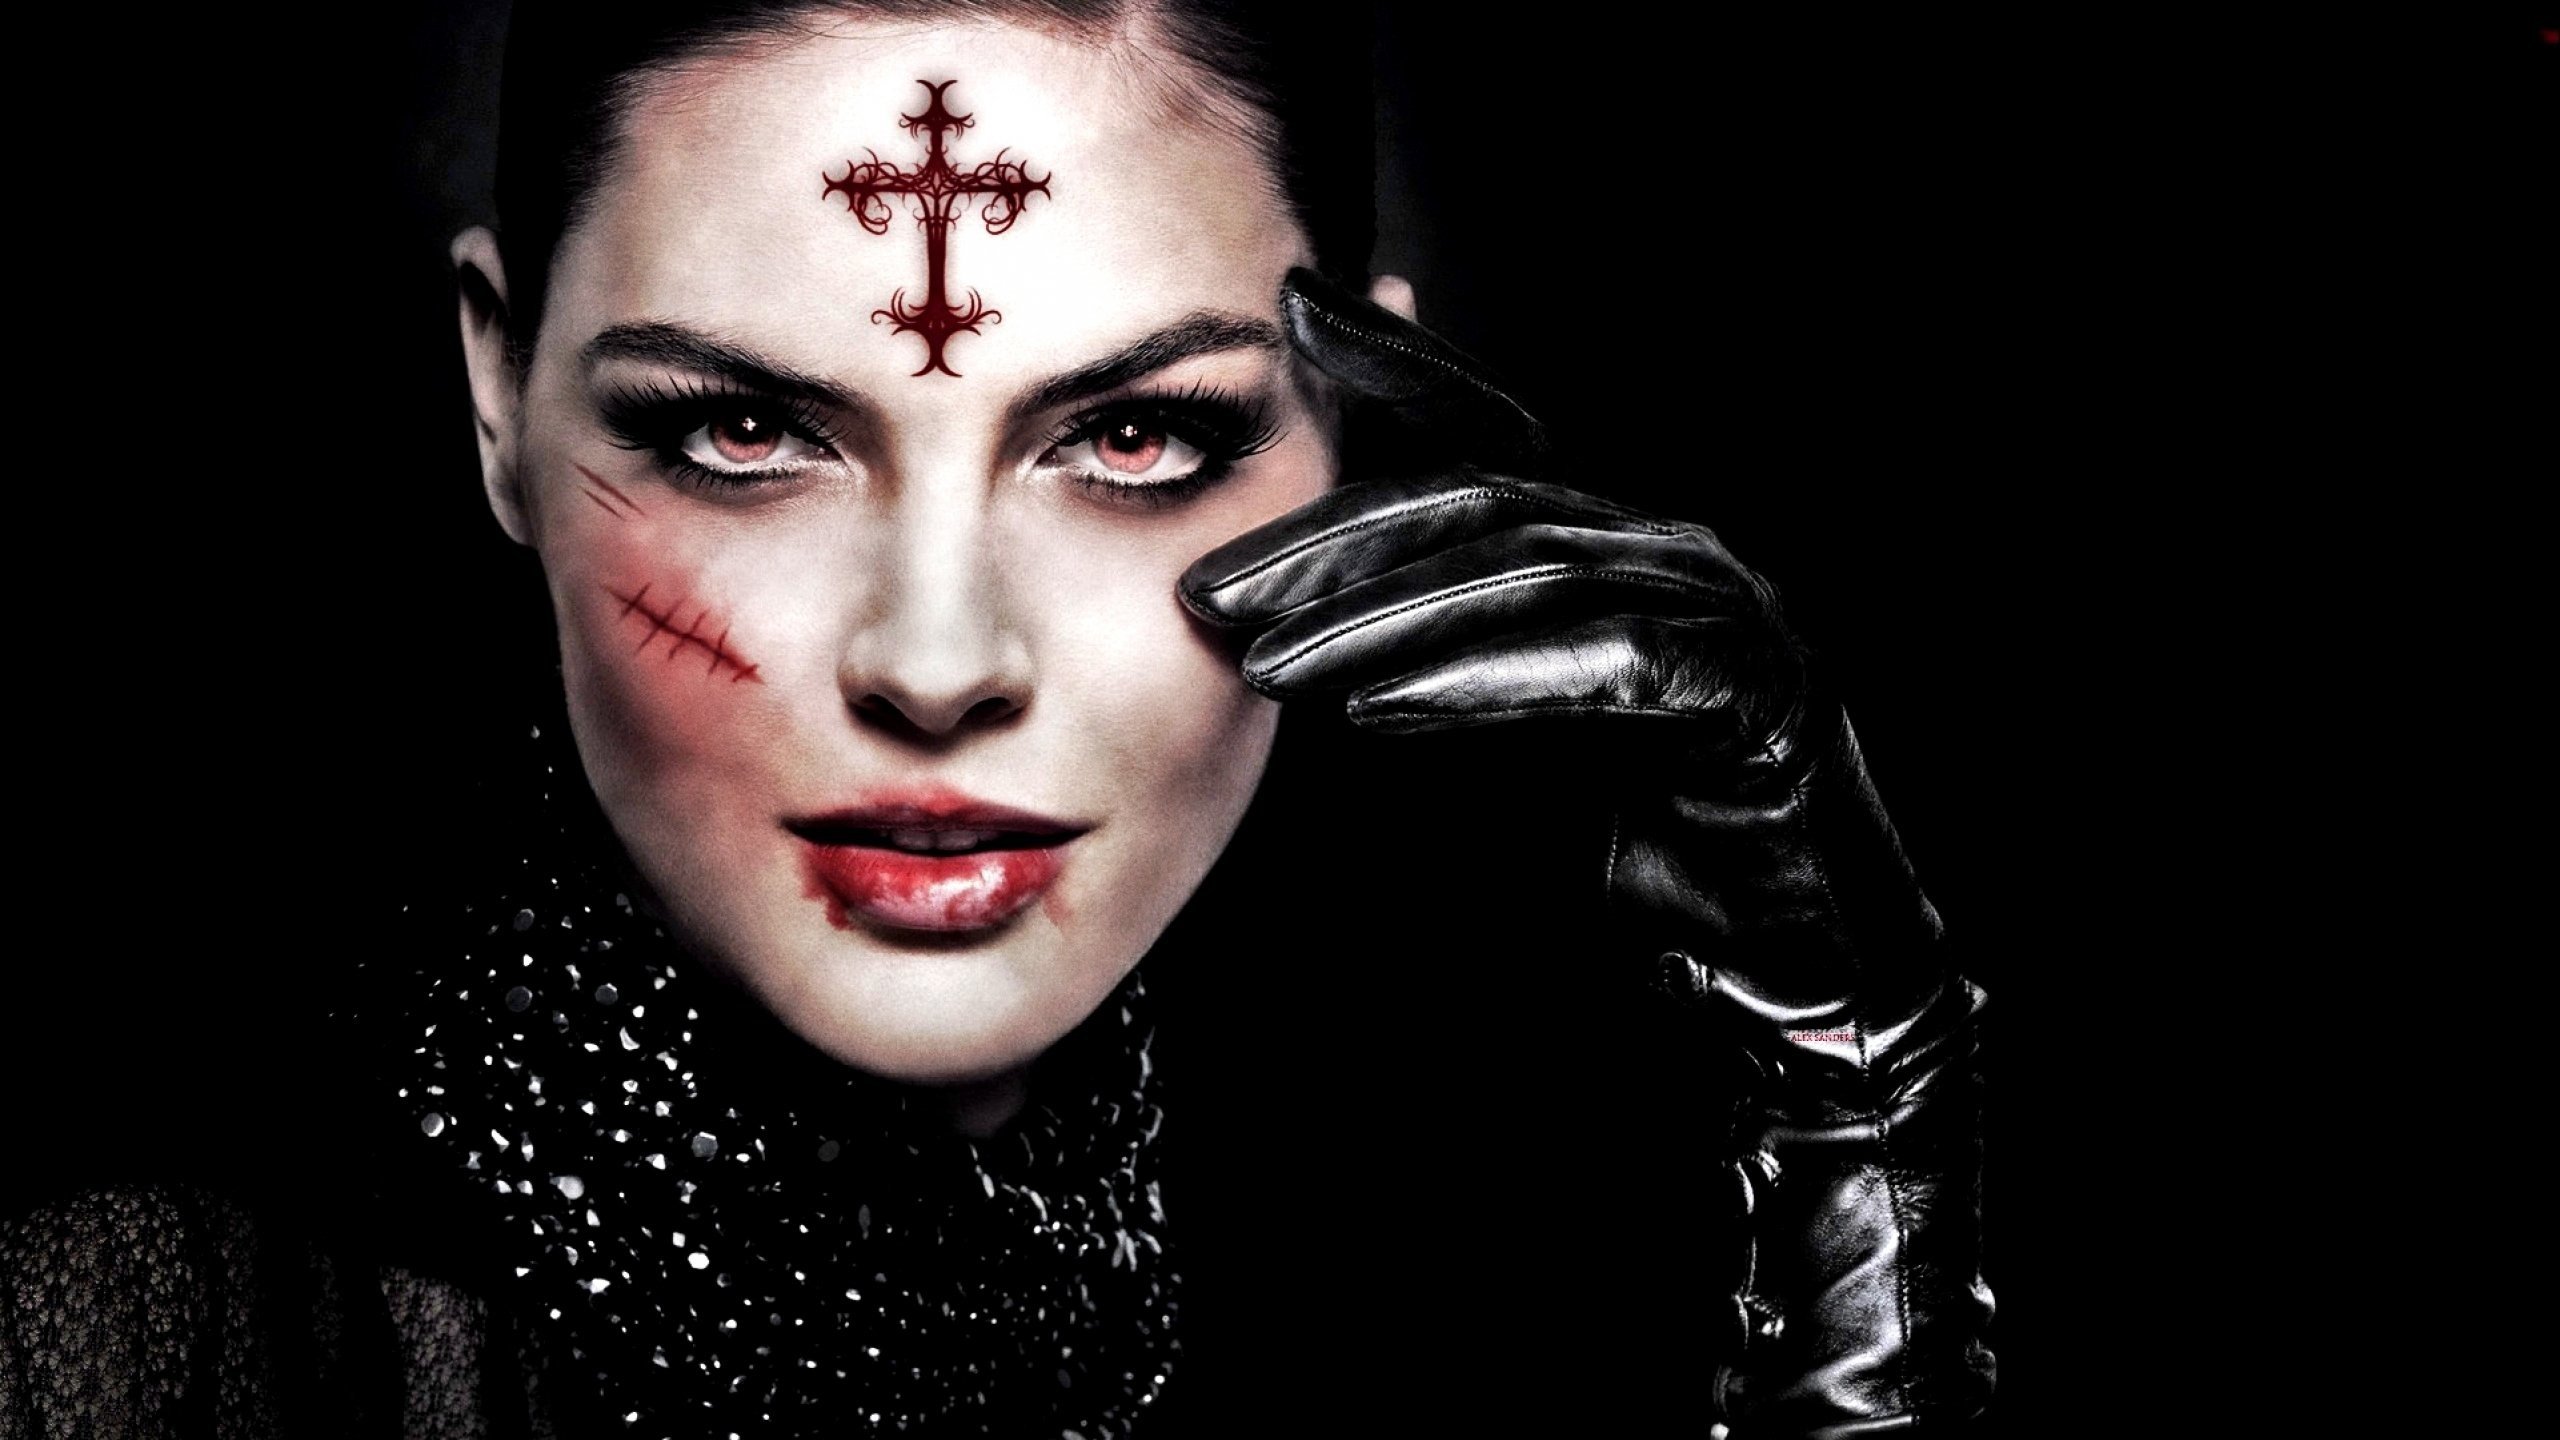 Dark Evil Occult Satanic Satan Vampire Wallpaper At Dark Wallpapers